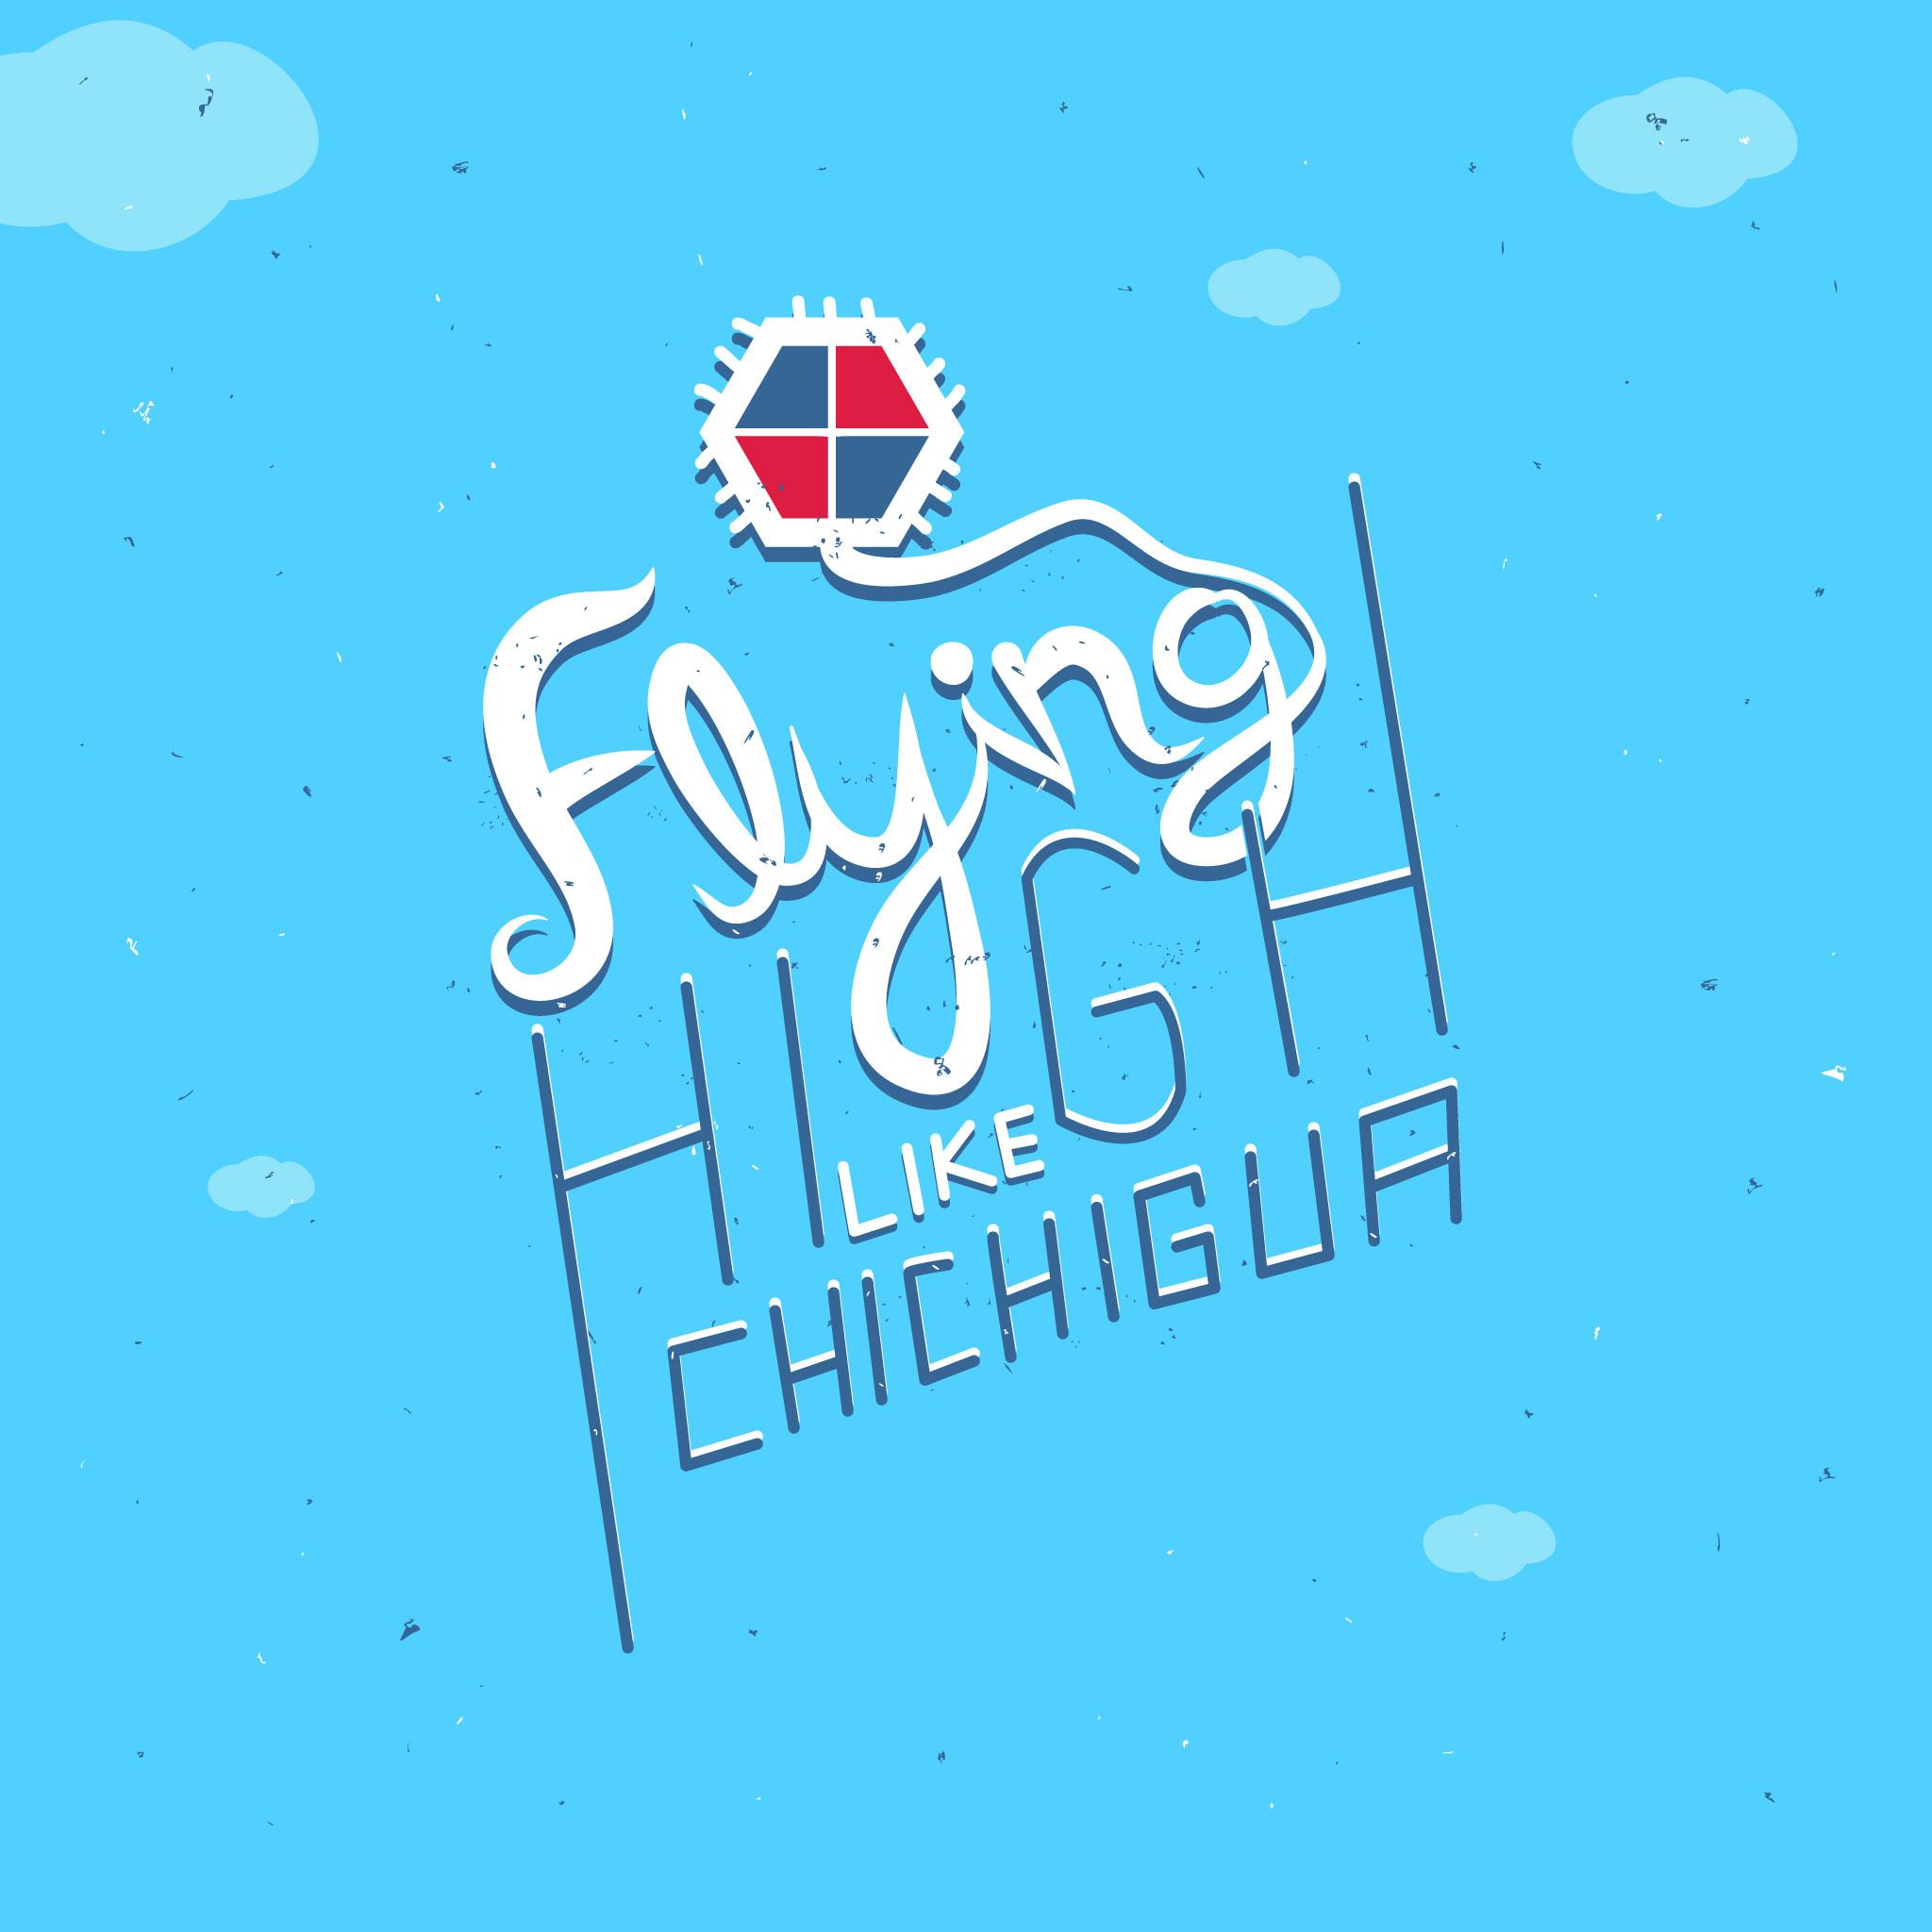 Flying High Like A Chichigua